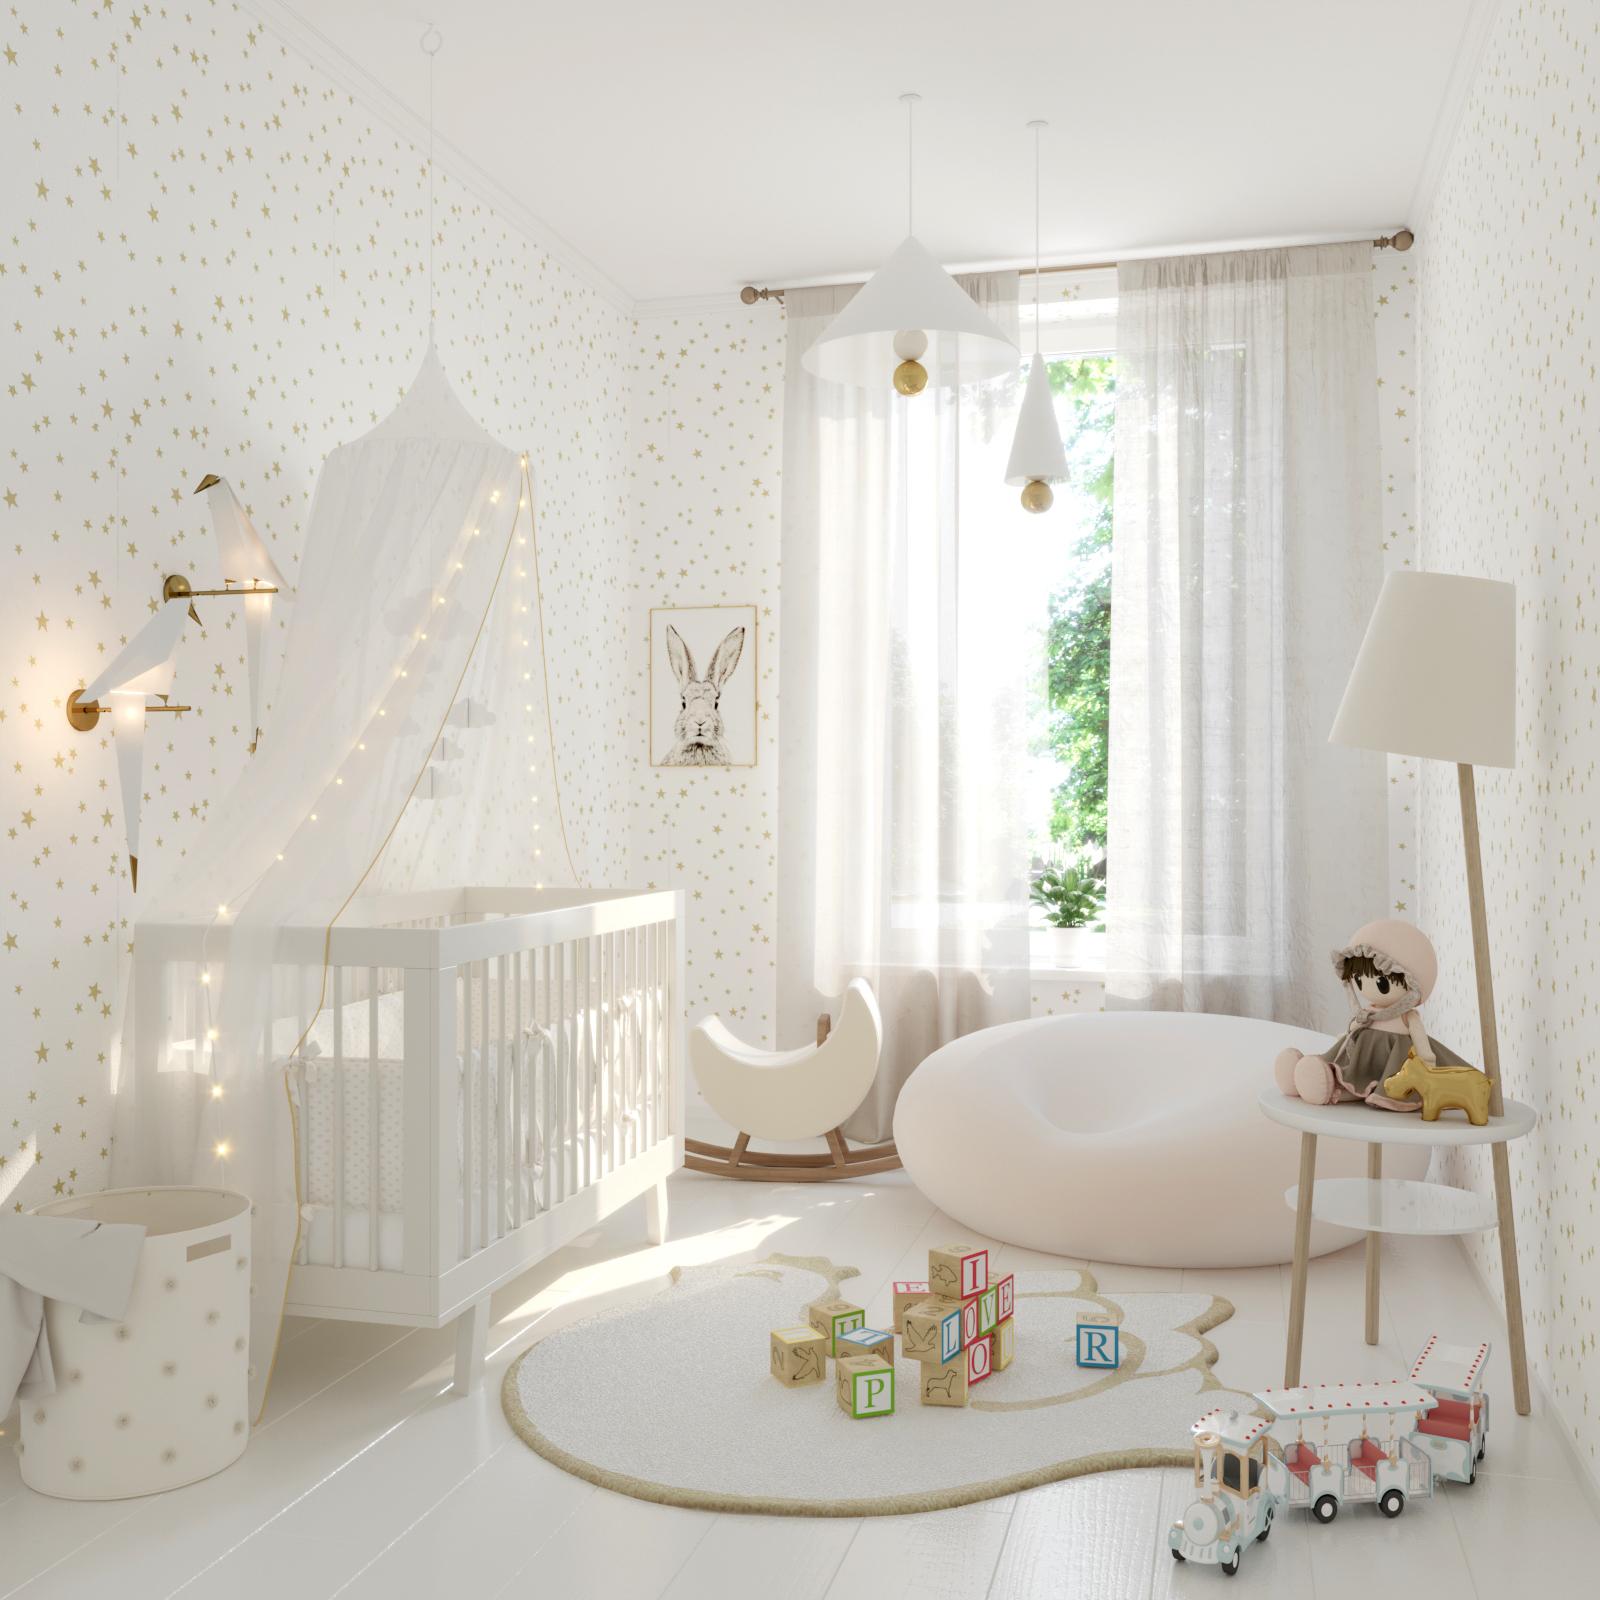 Nursery Room Dove.jpg